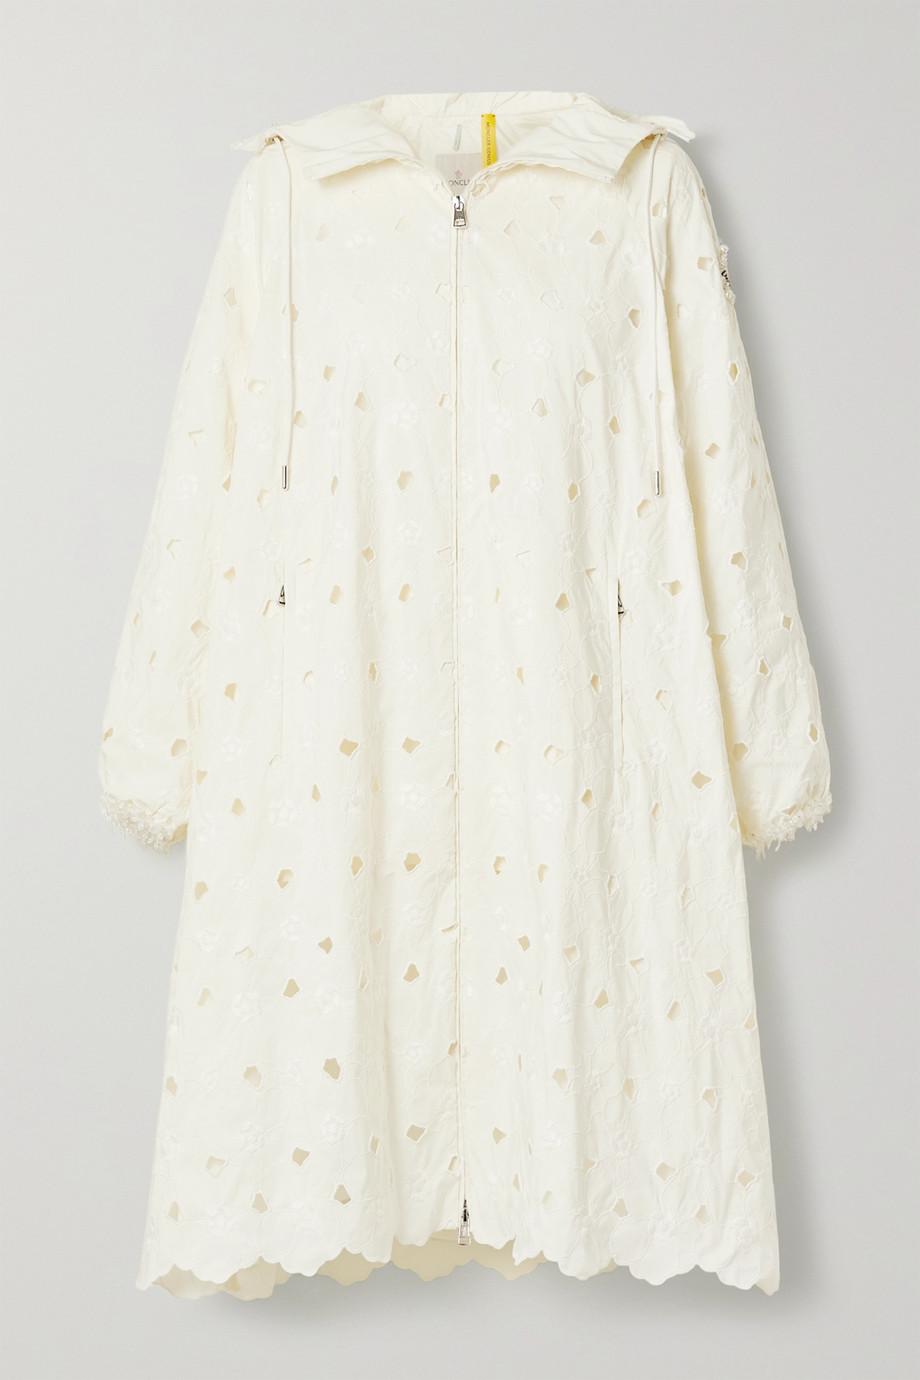 Moncler Genius + 4 Simone Rocha Zaleaia hooded bead-embellished embroidered shell coat